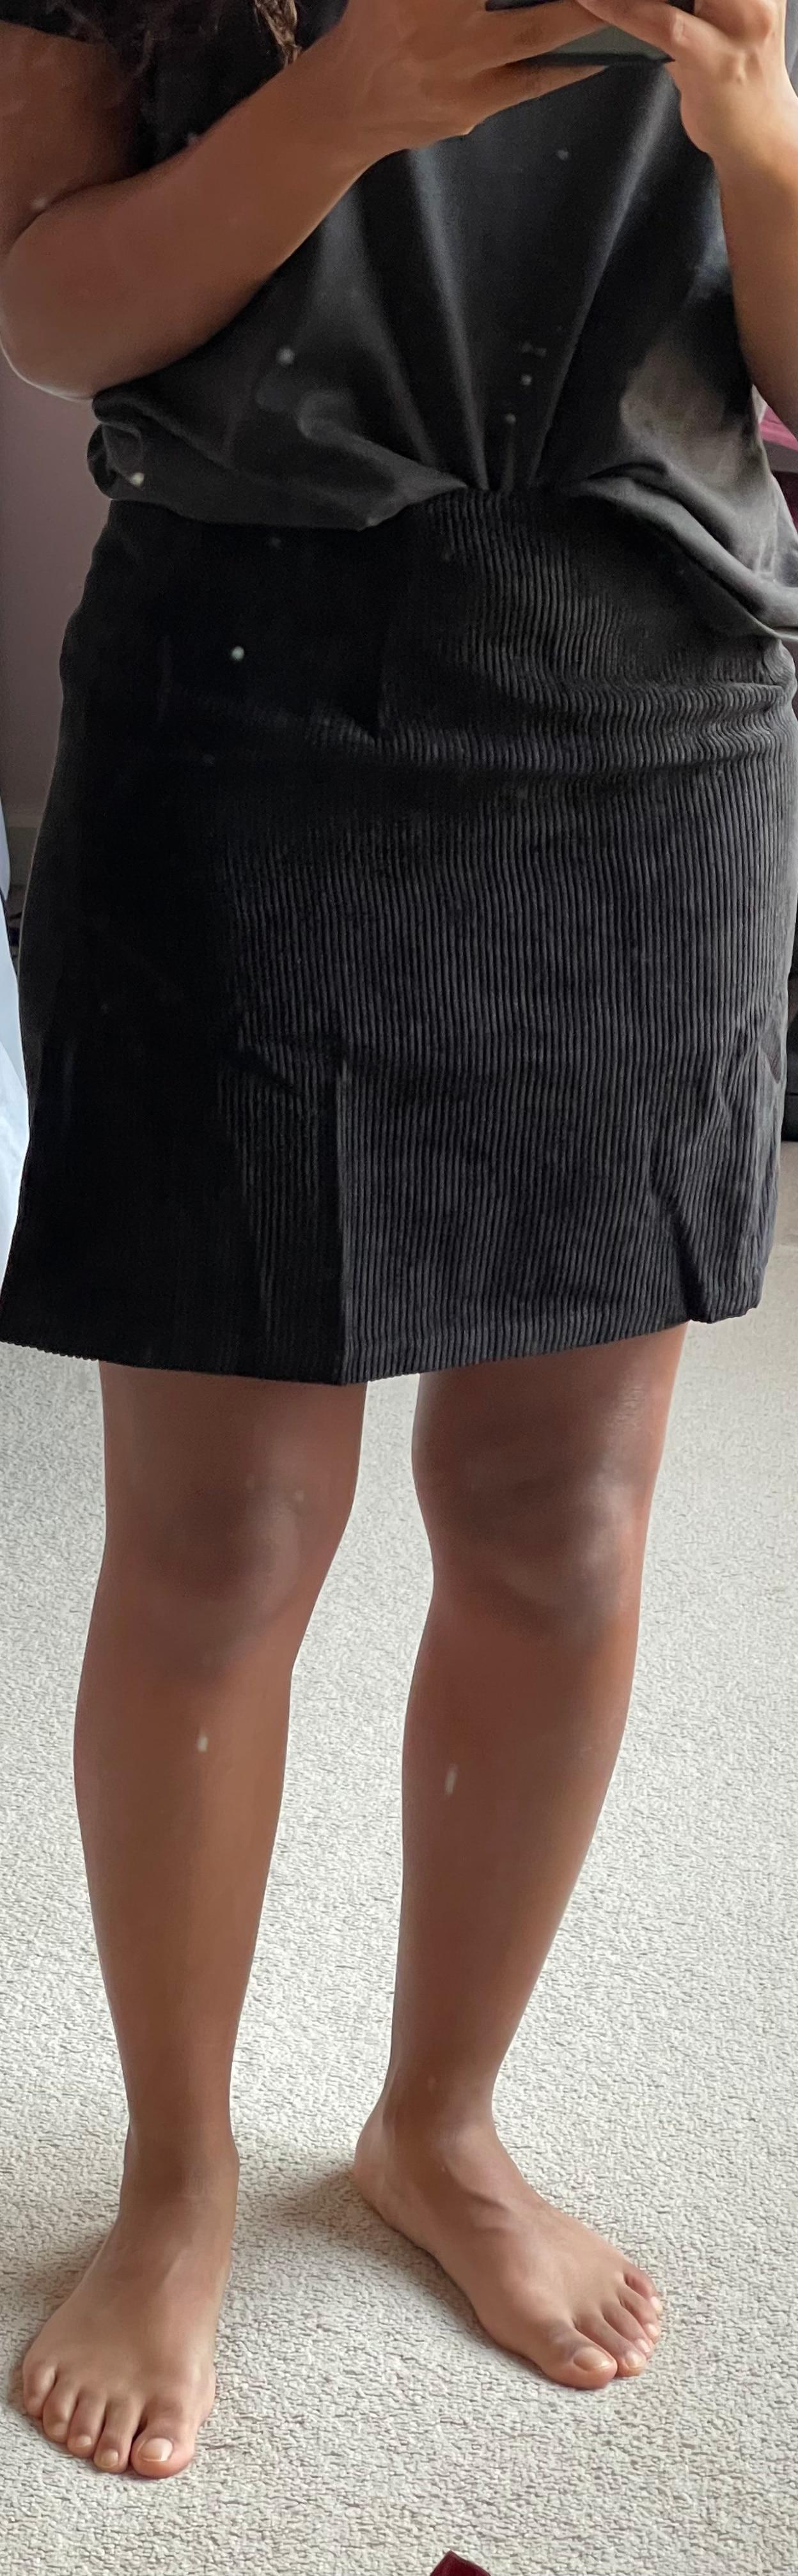 Woman corduroy skirt summer sexy mini Vintage harajuku skirts mini  slit slim high waist straight skirt ladies korean style 2020 Skirts    - AliExpress